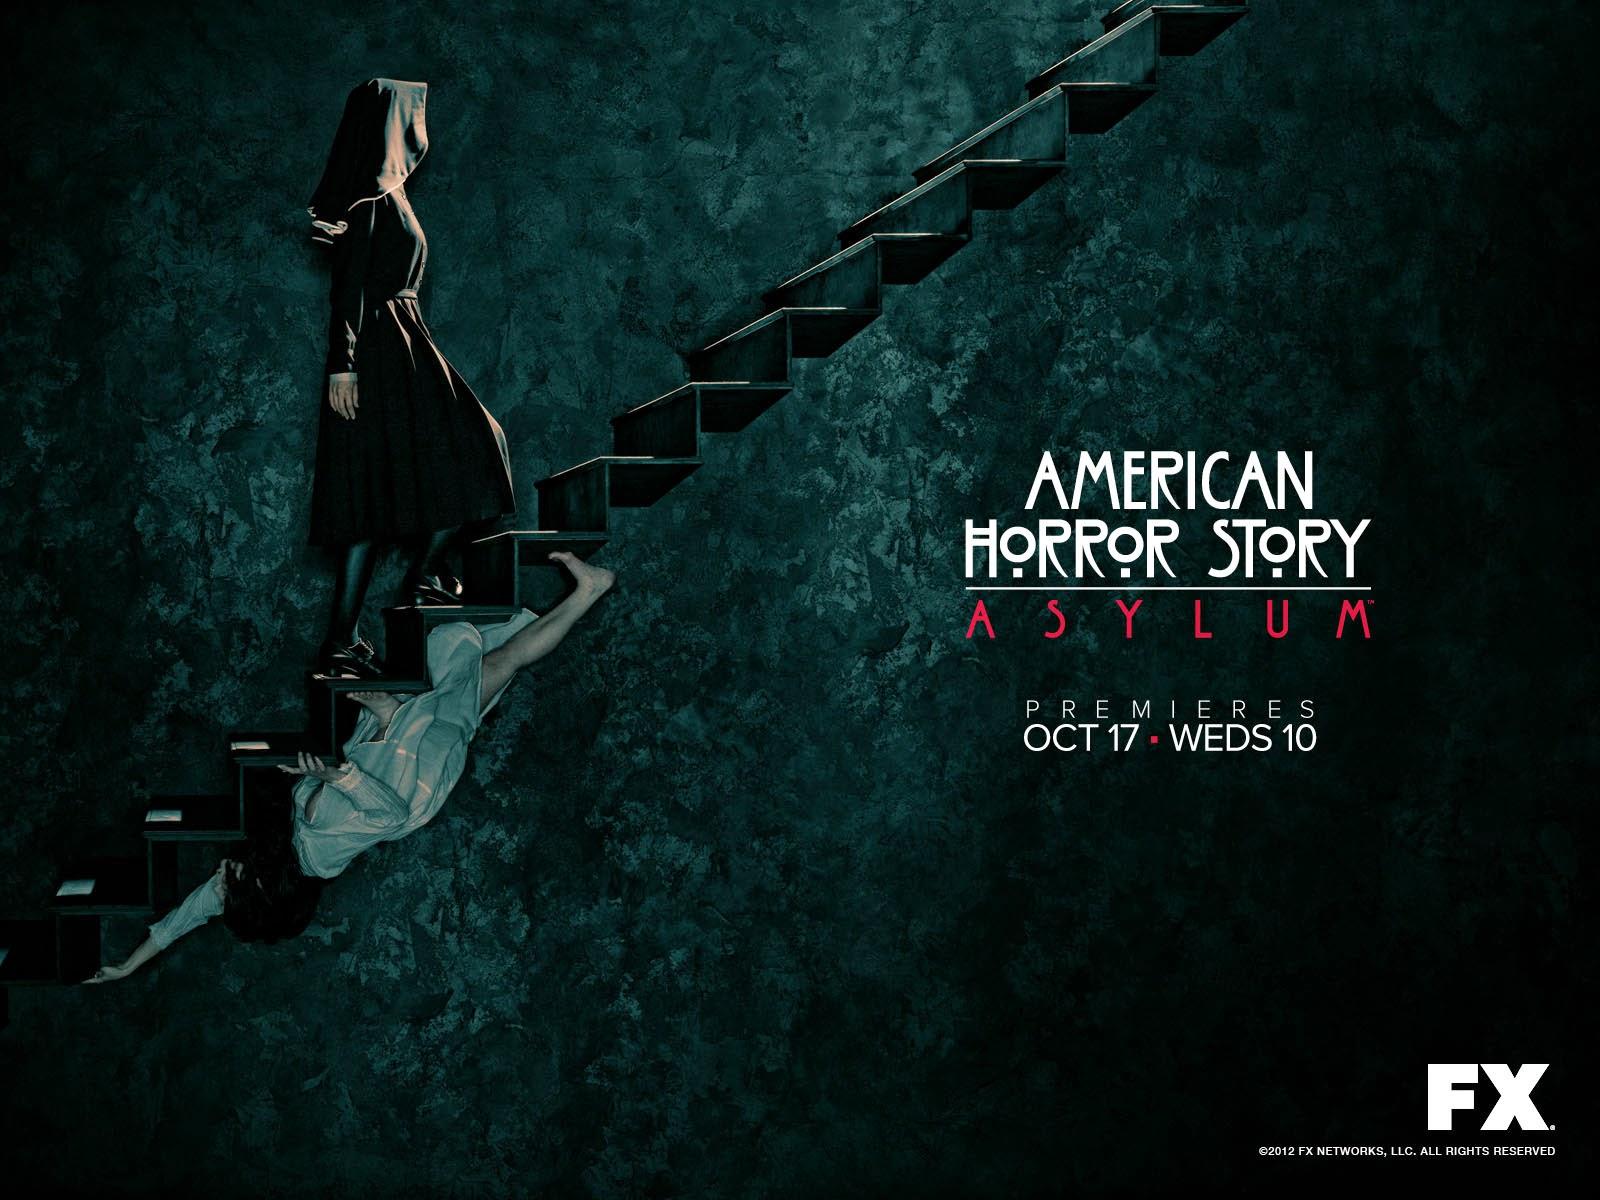 Nonton American Horror Story season 6 sub indo